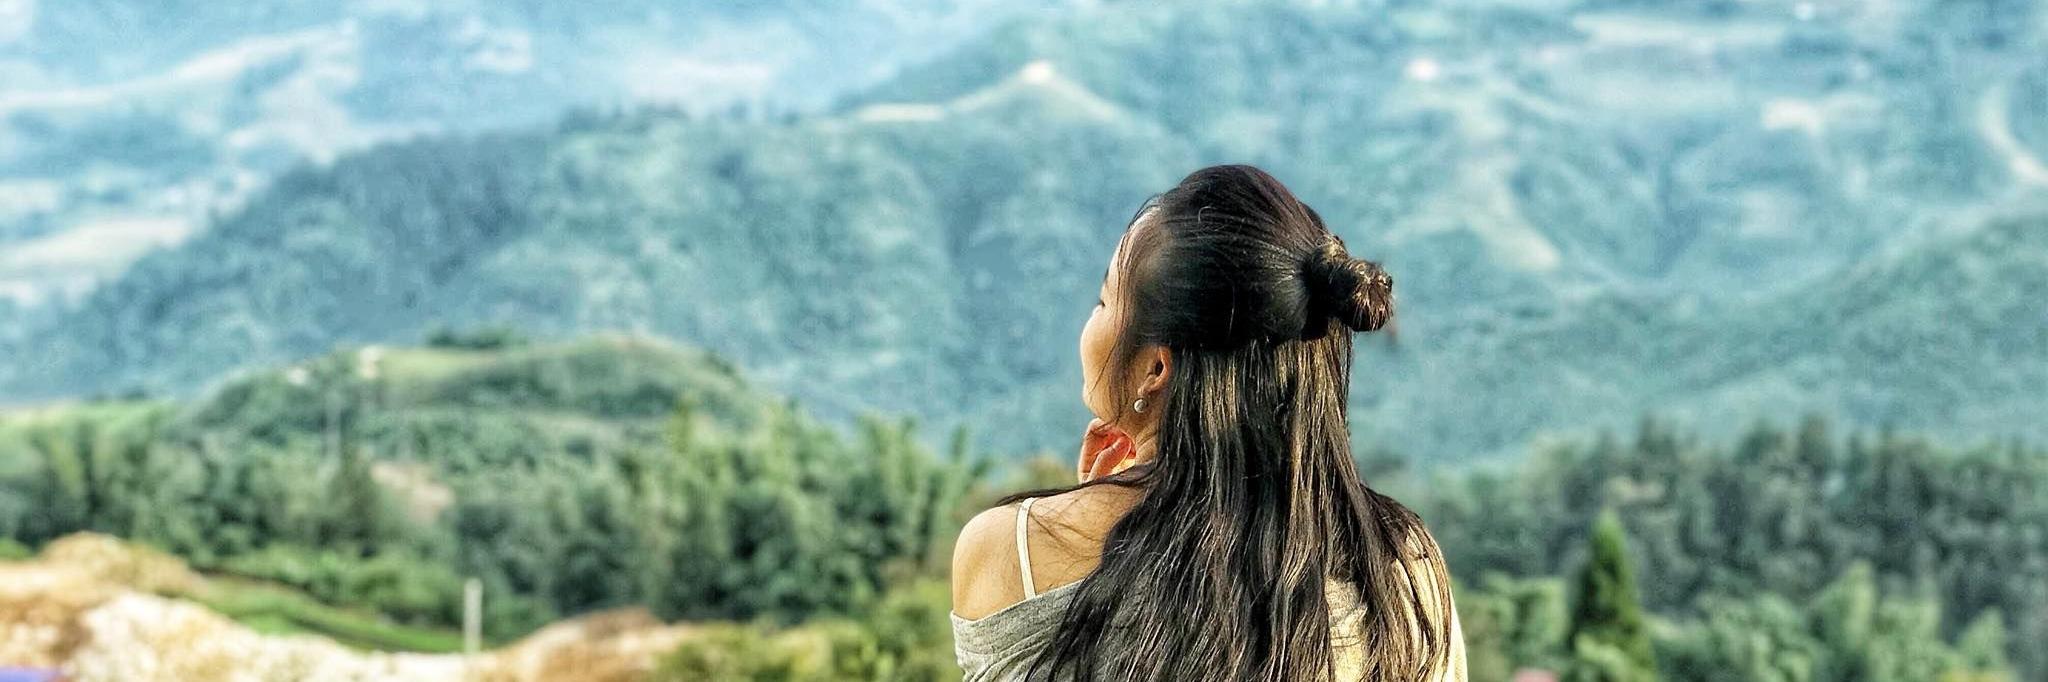 https://gody.vn/blog/knigh.gody/post/kinh-nghiem-du-lich-thac-bac-sapa-di-chuyen-thoi-diem-tham-quan-4387